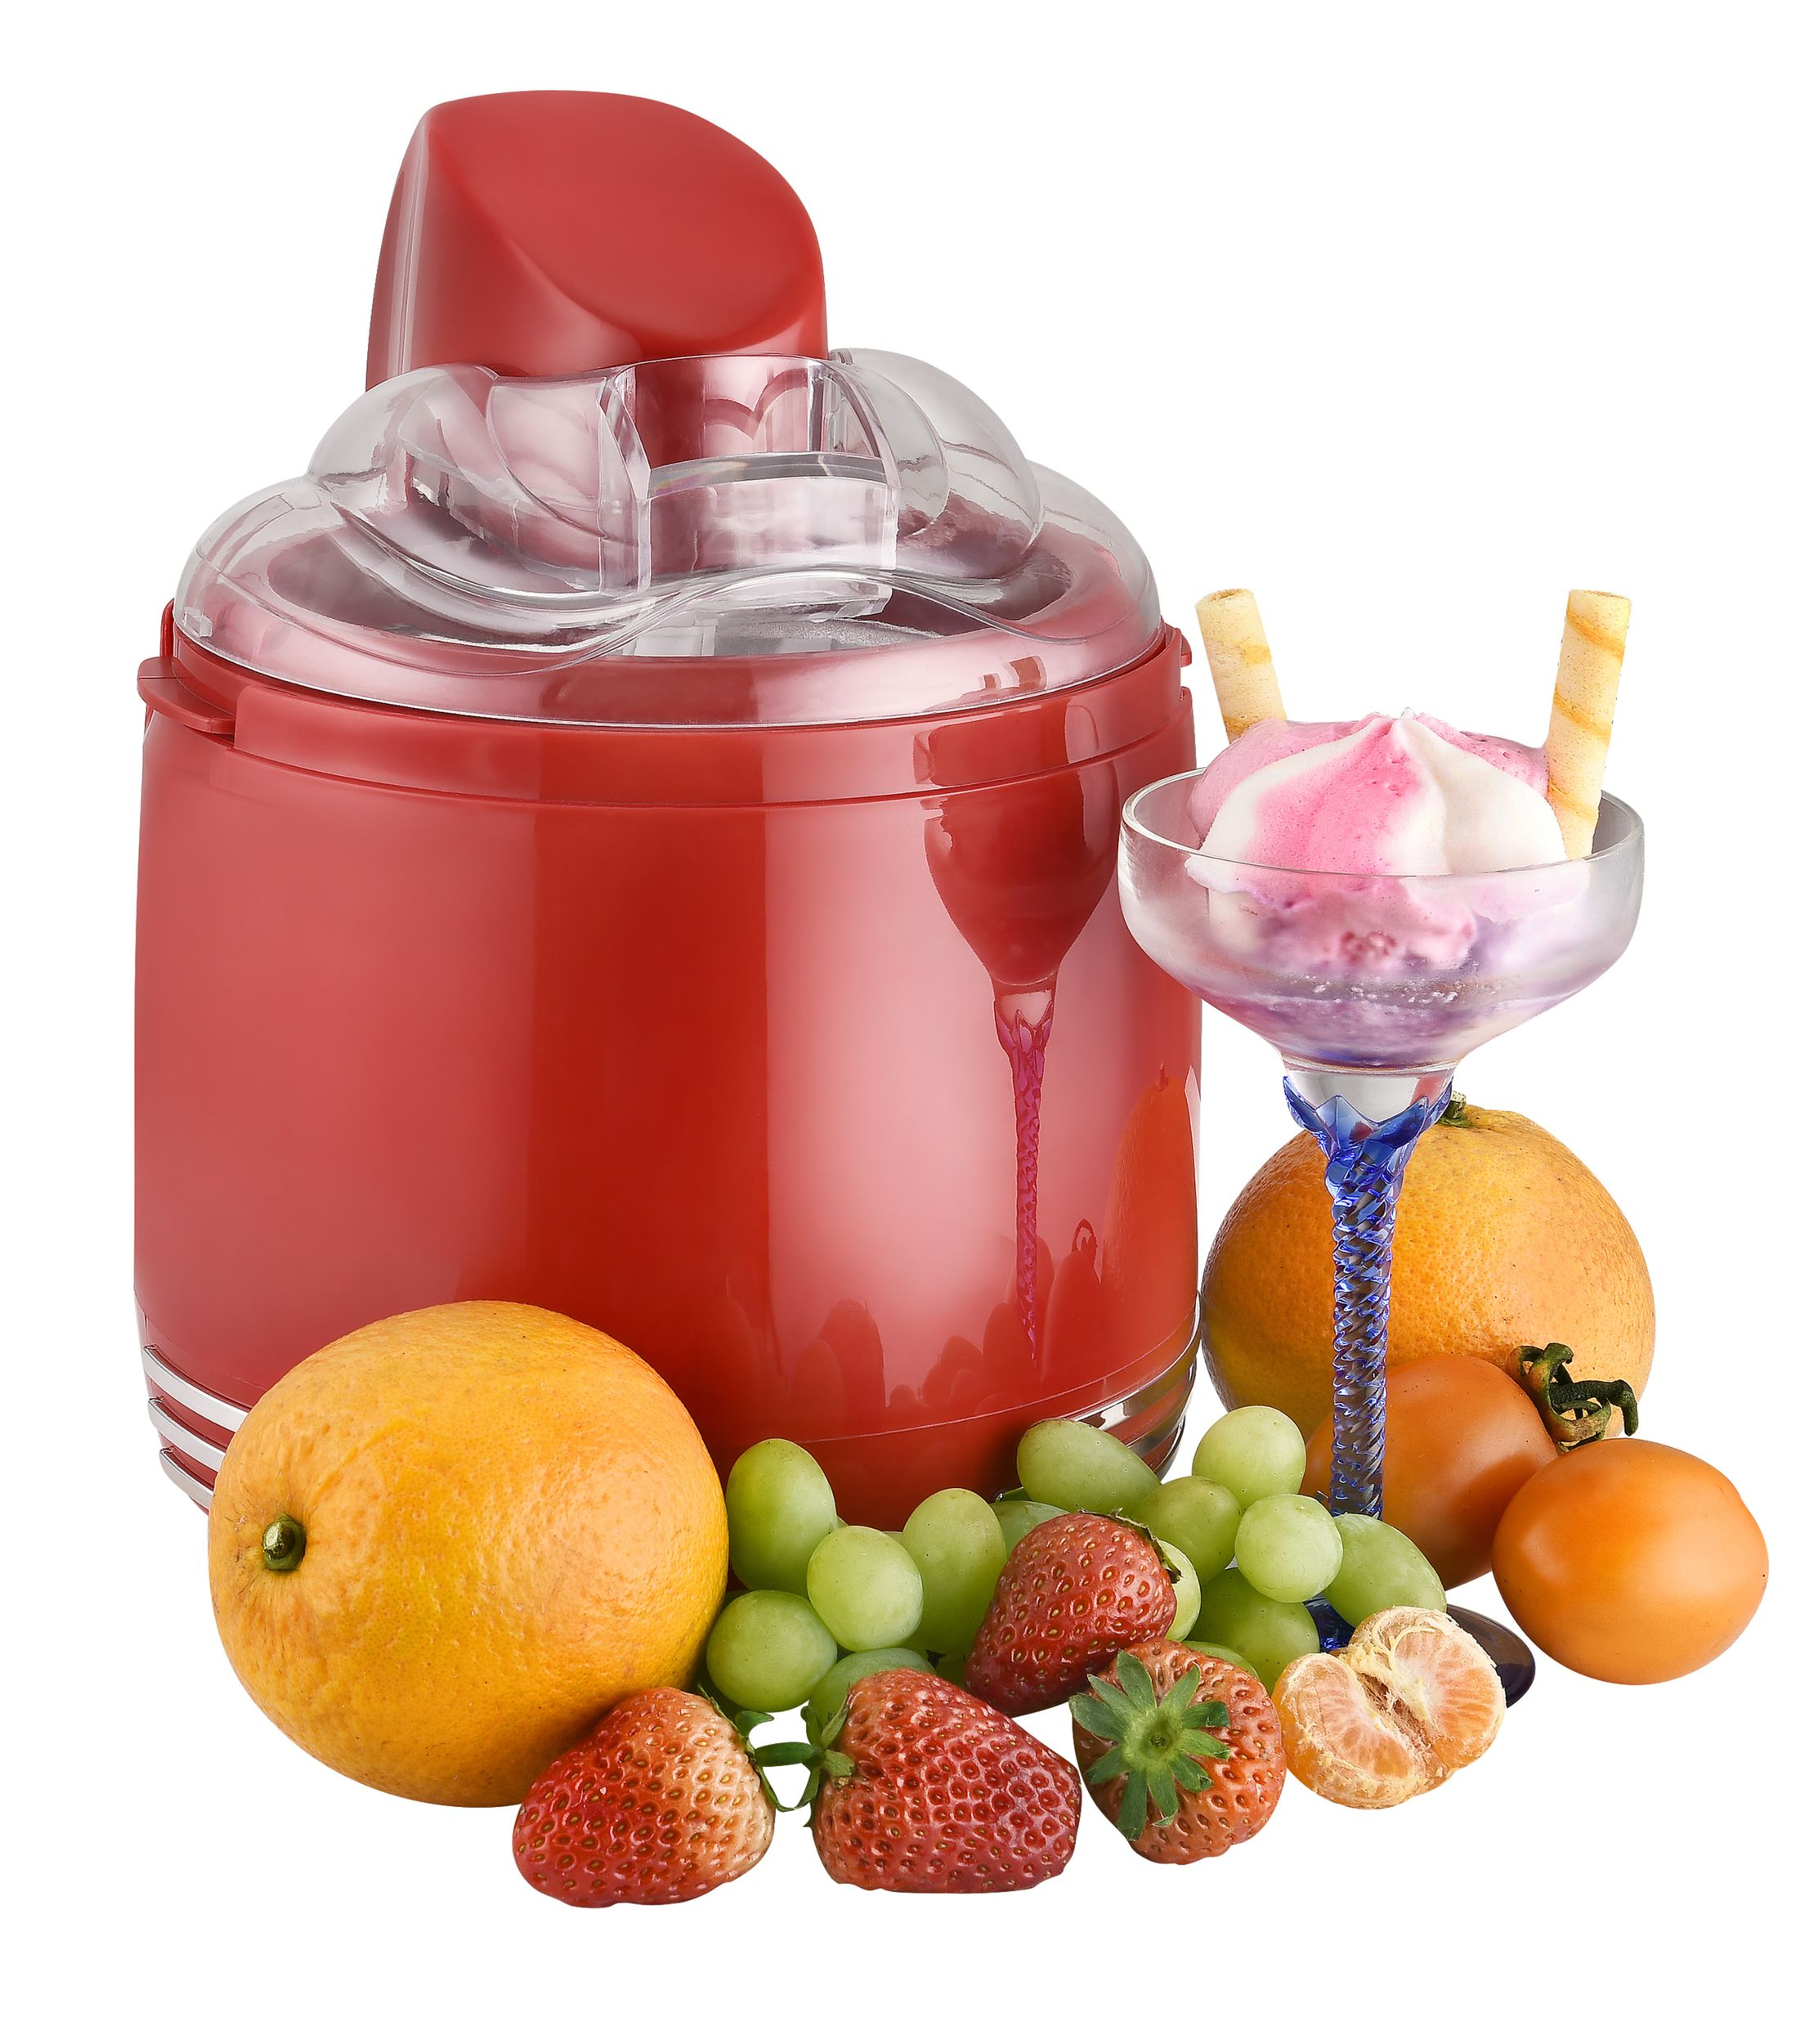 2 in 1 Retro Eismaschine Joghurtbereiter Eiscreme Joghurt Maker Kühlgefäß rot NEU 15 W *94074